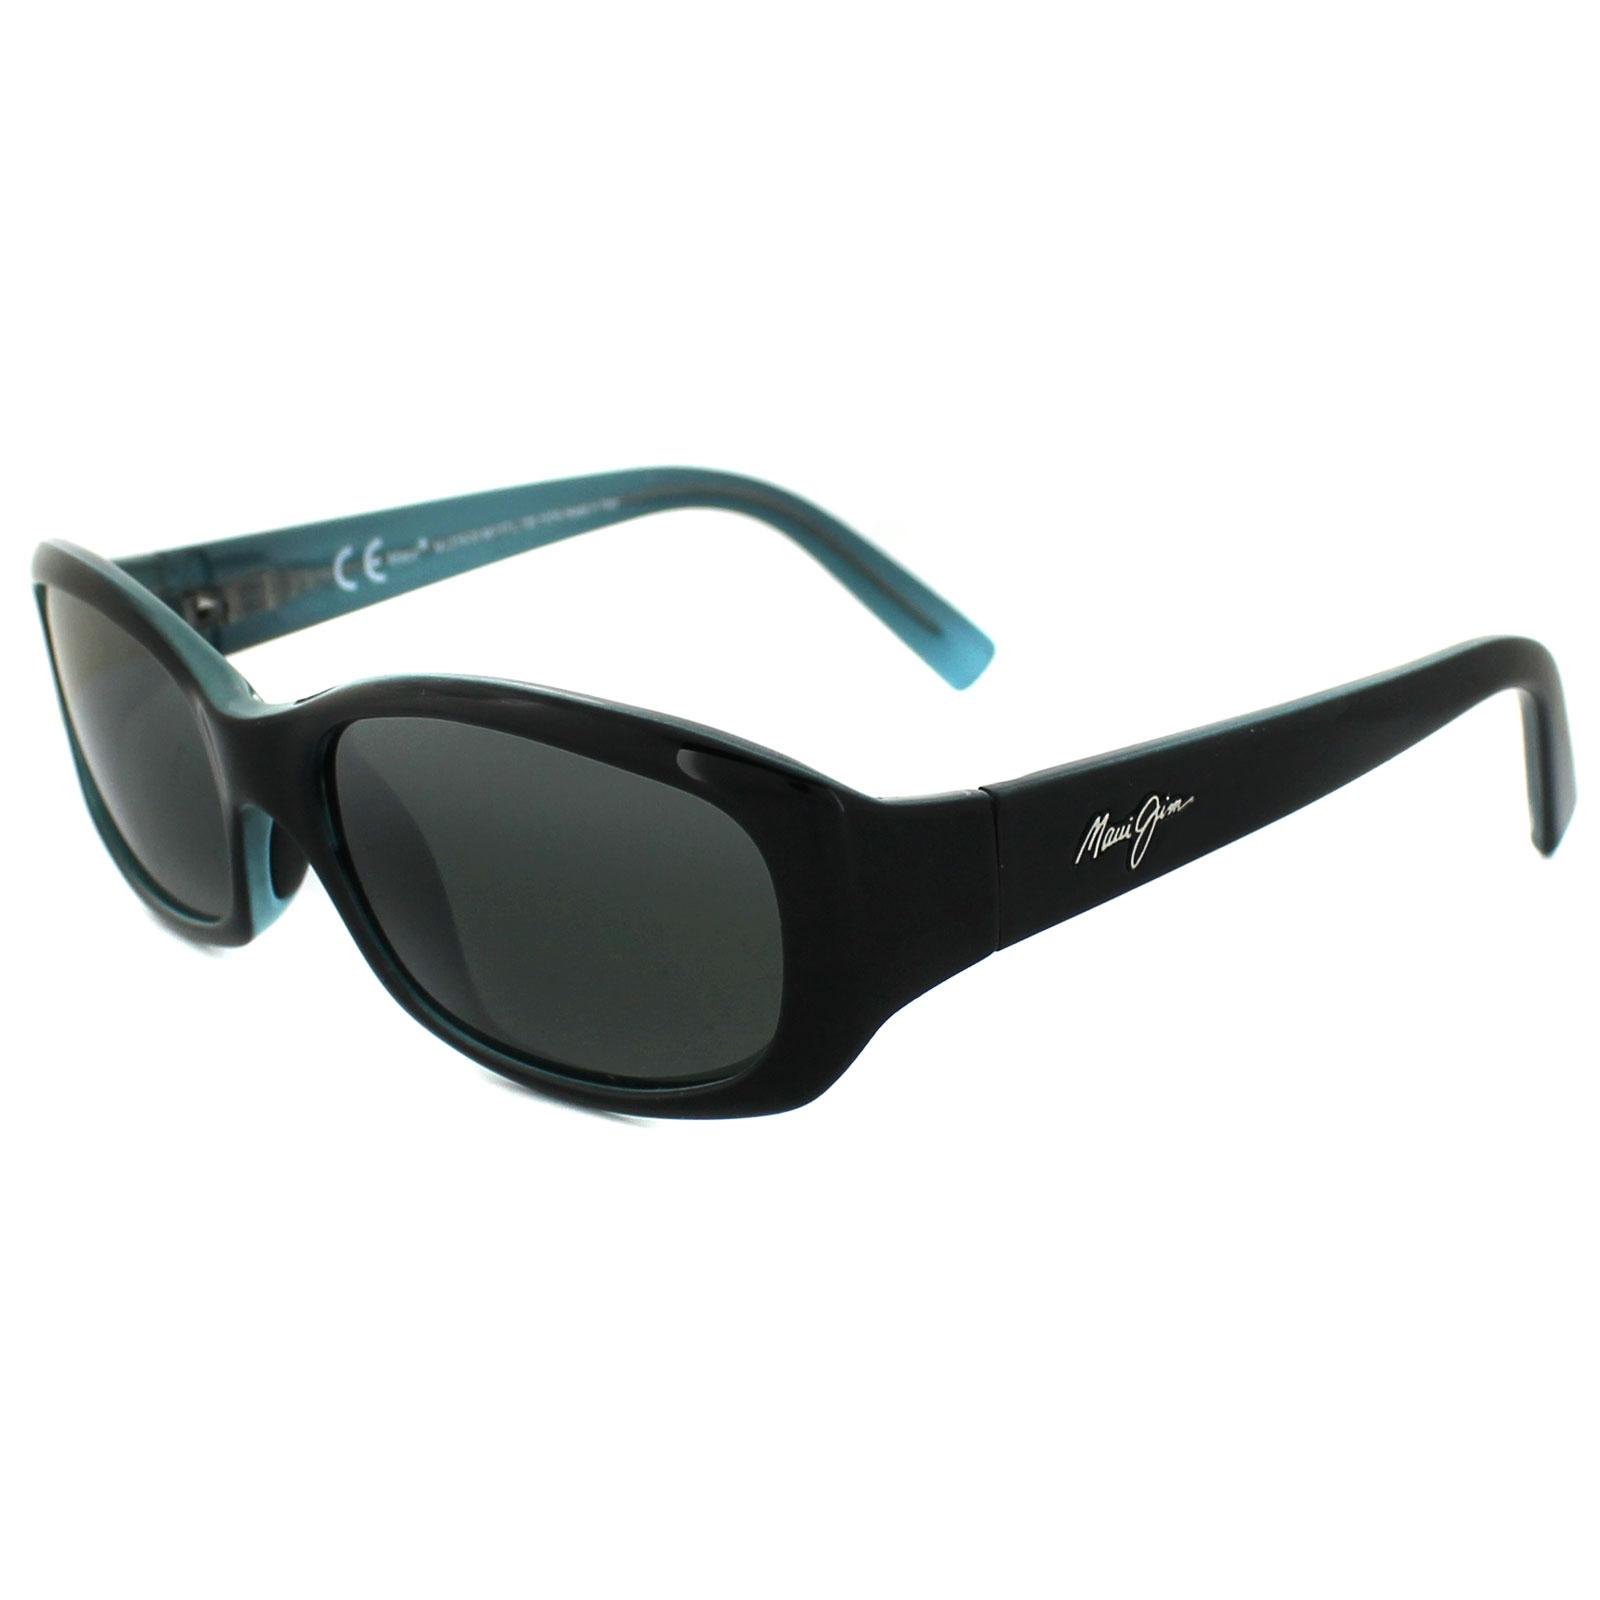 8f536ae168 Sentinel Maui Jim Sunglasses Punchbowl 219-03 Black with Blue Neutral Grey  Polarized